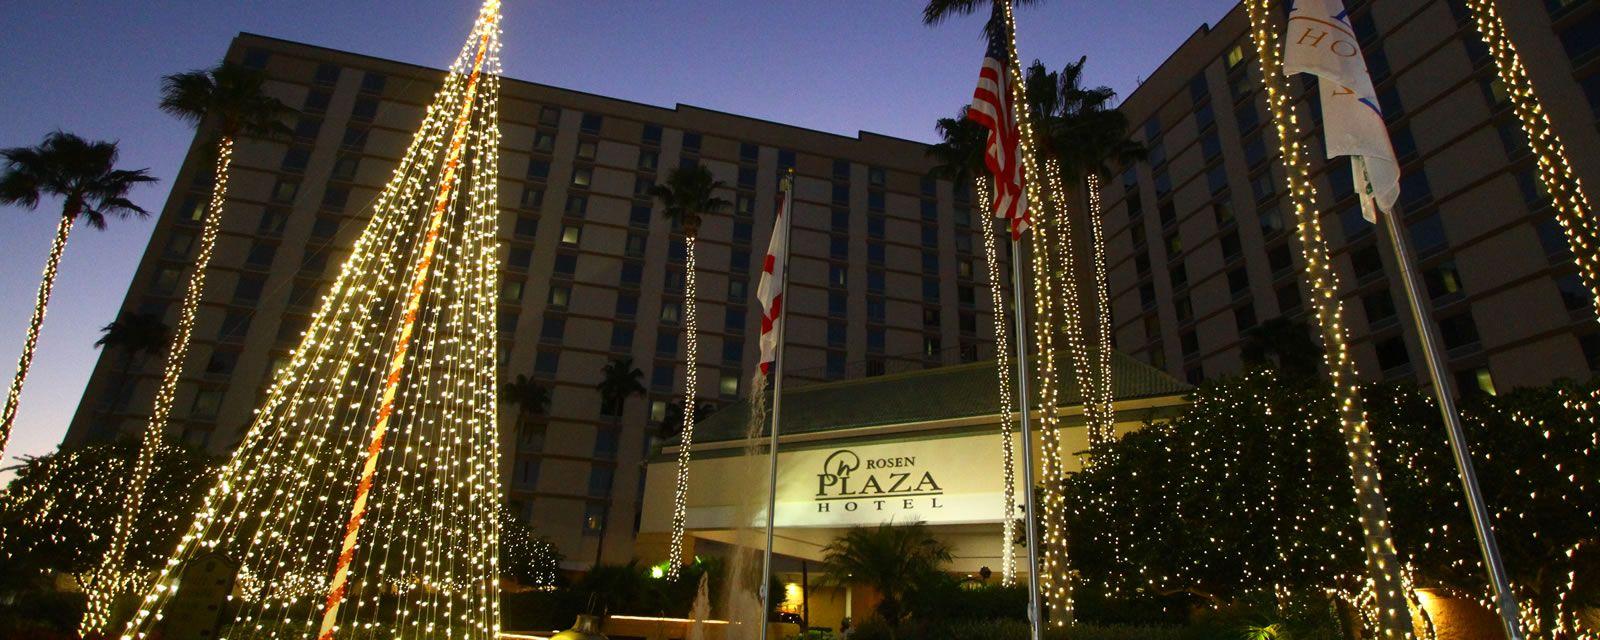 Rosen Plaza lit up for the holidays